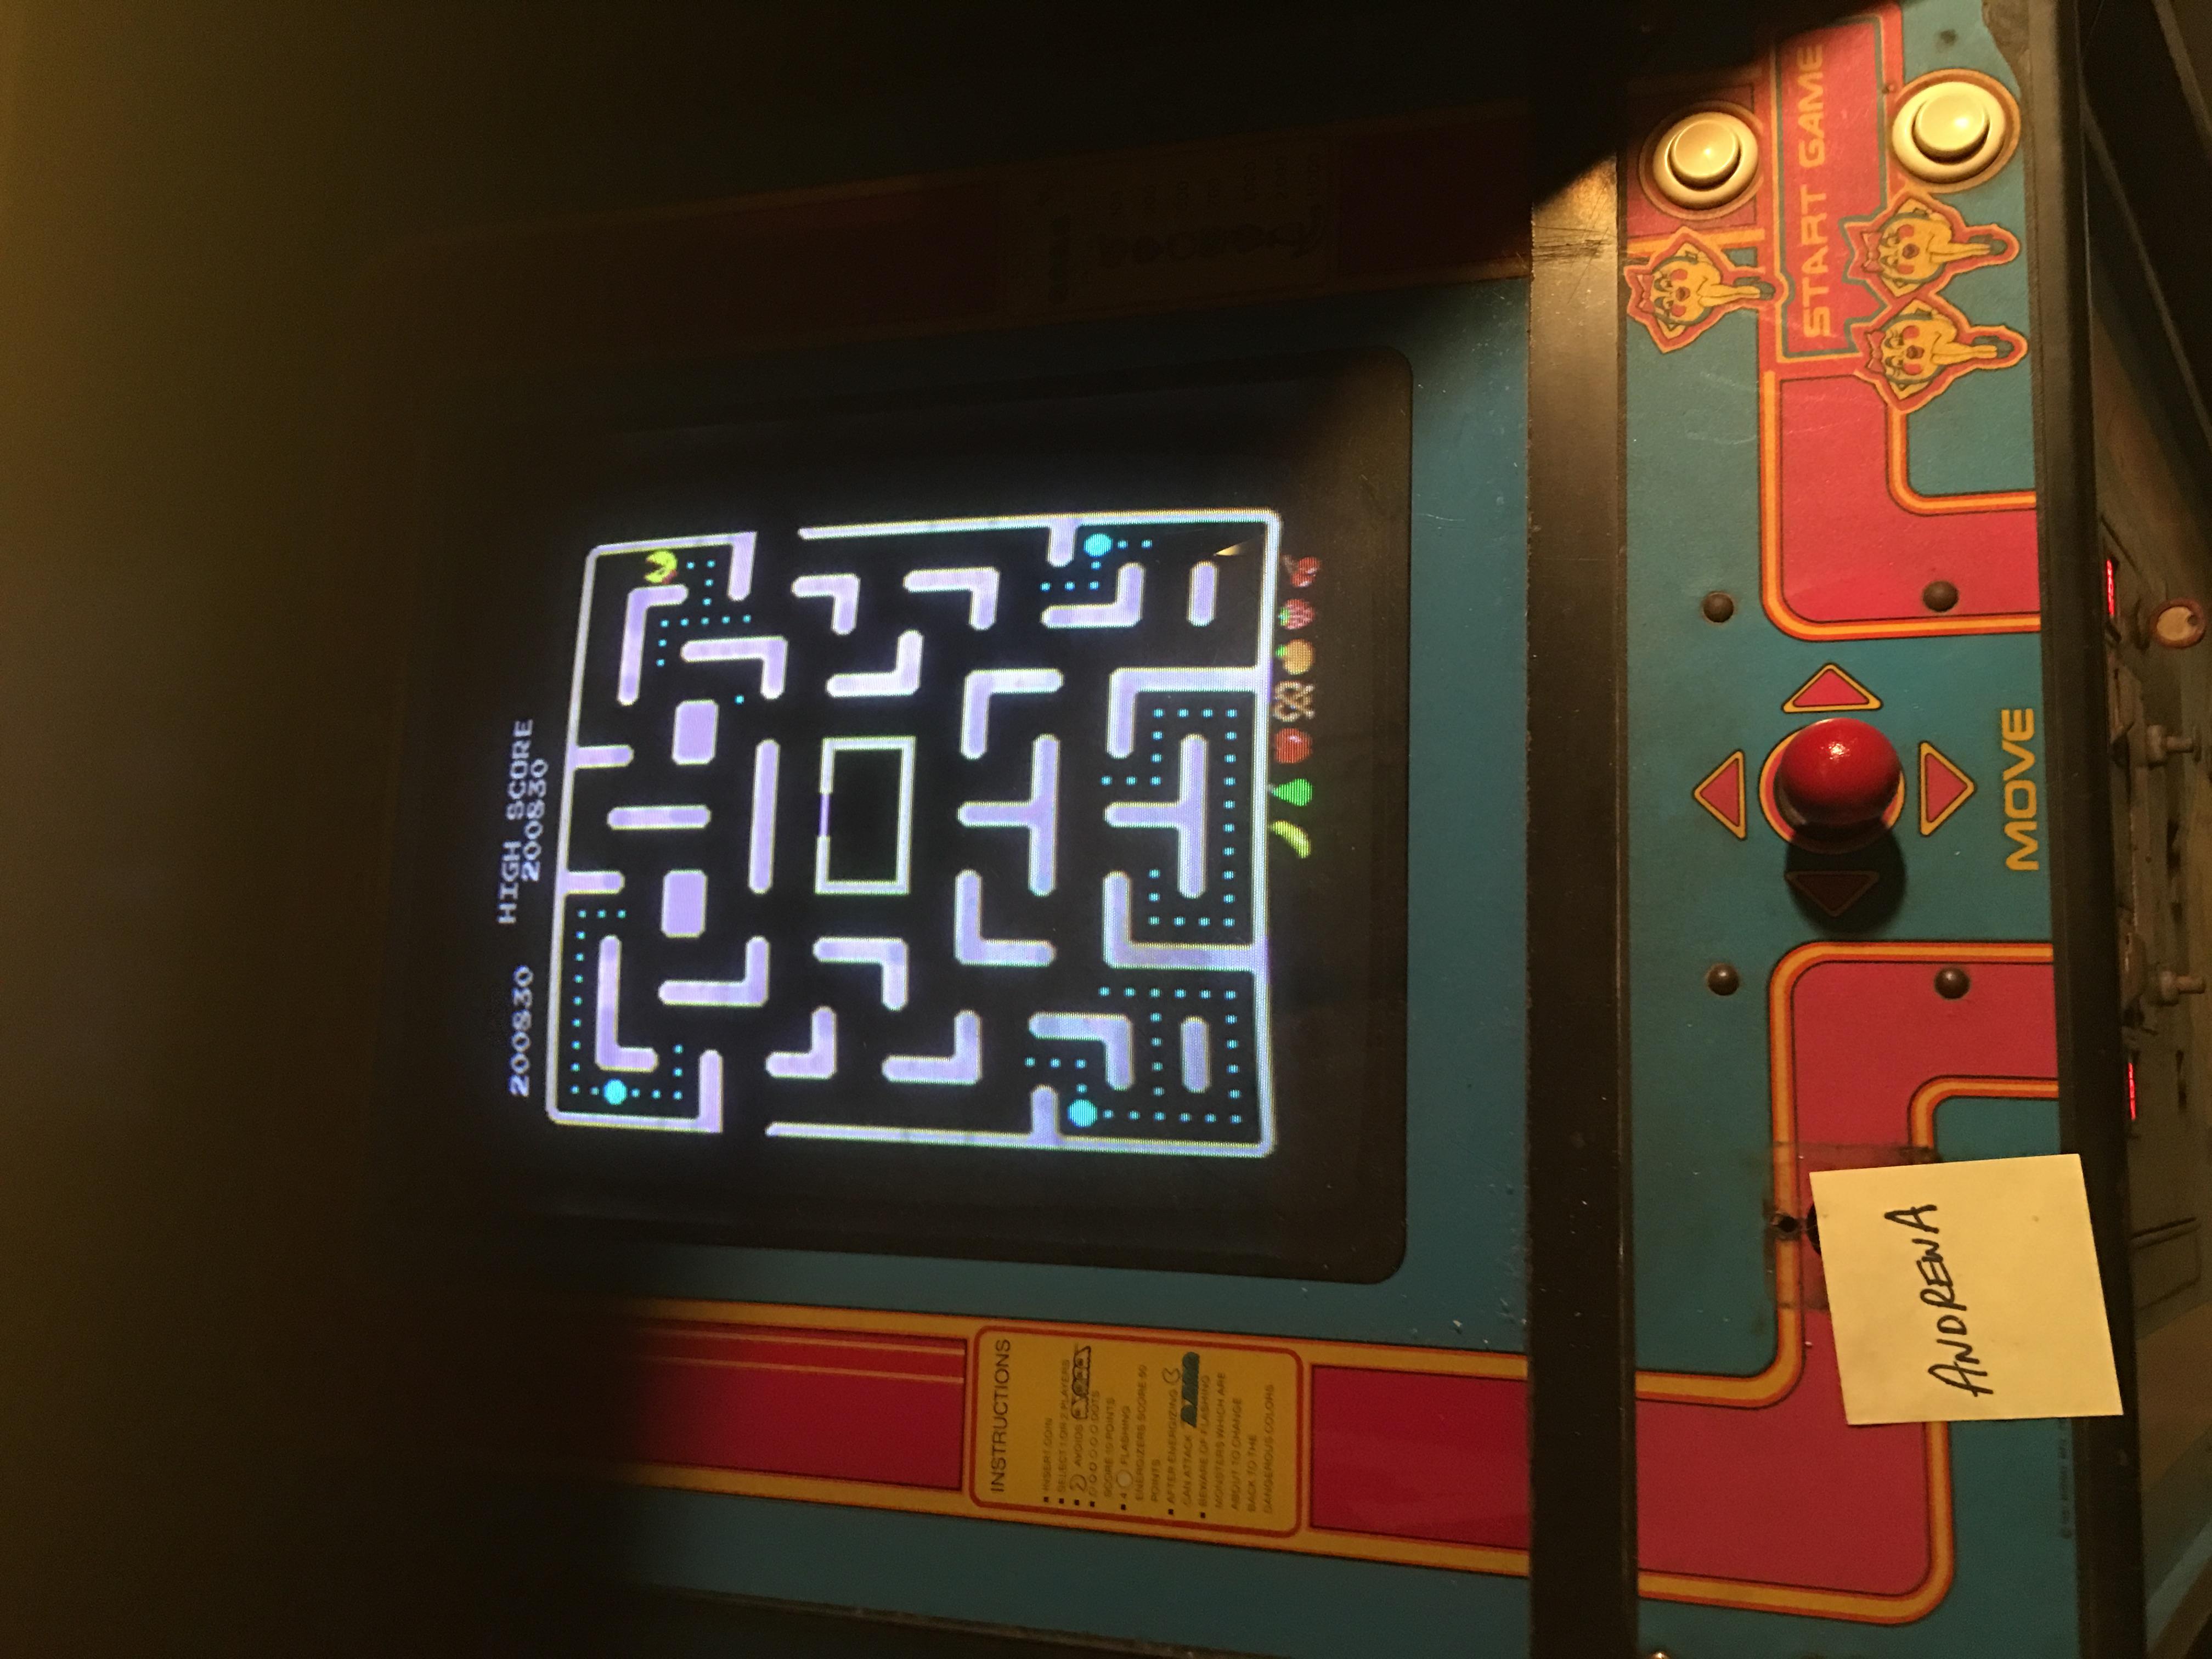 AndrewA: Ms. Pac-Man [Turbo] (Arcade) 200,830 points on 2017-11-04 17:59:43